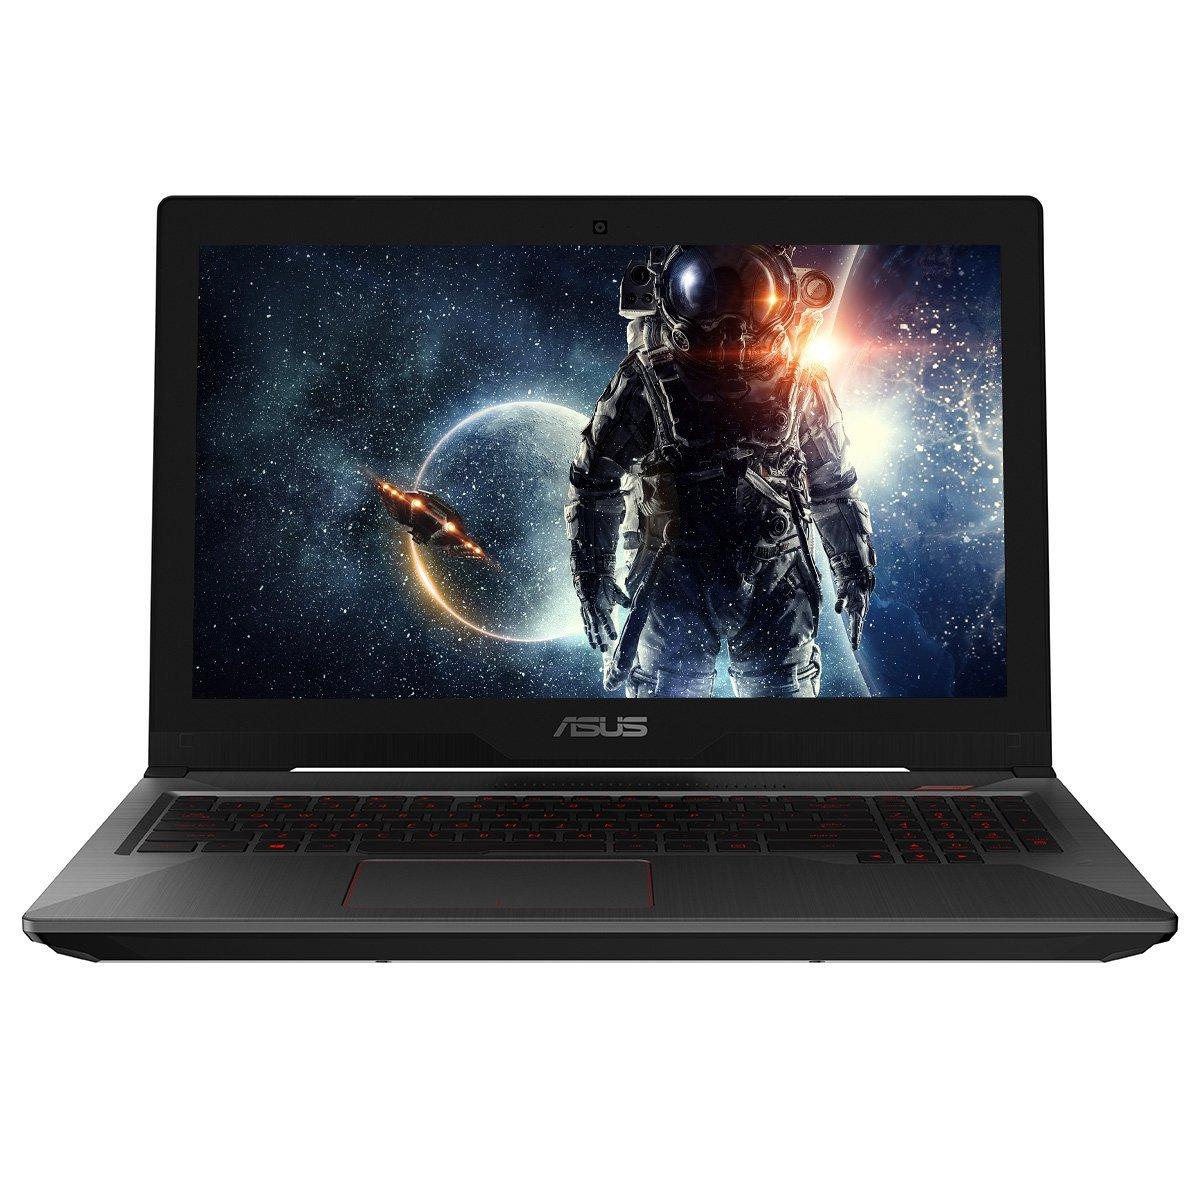 ASUS FX503VM-DM042T 15.6-inch Gaming Laptop (Black) - (Intel i5-7300HQ Processor, Nvidia GTX 1060 Dedicated Graphics, 8GB RAM, 1TB HDD + 128GB SSD, Windows 10) now £749.99 delivered @ Amazon